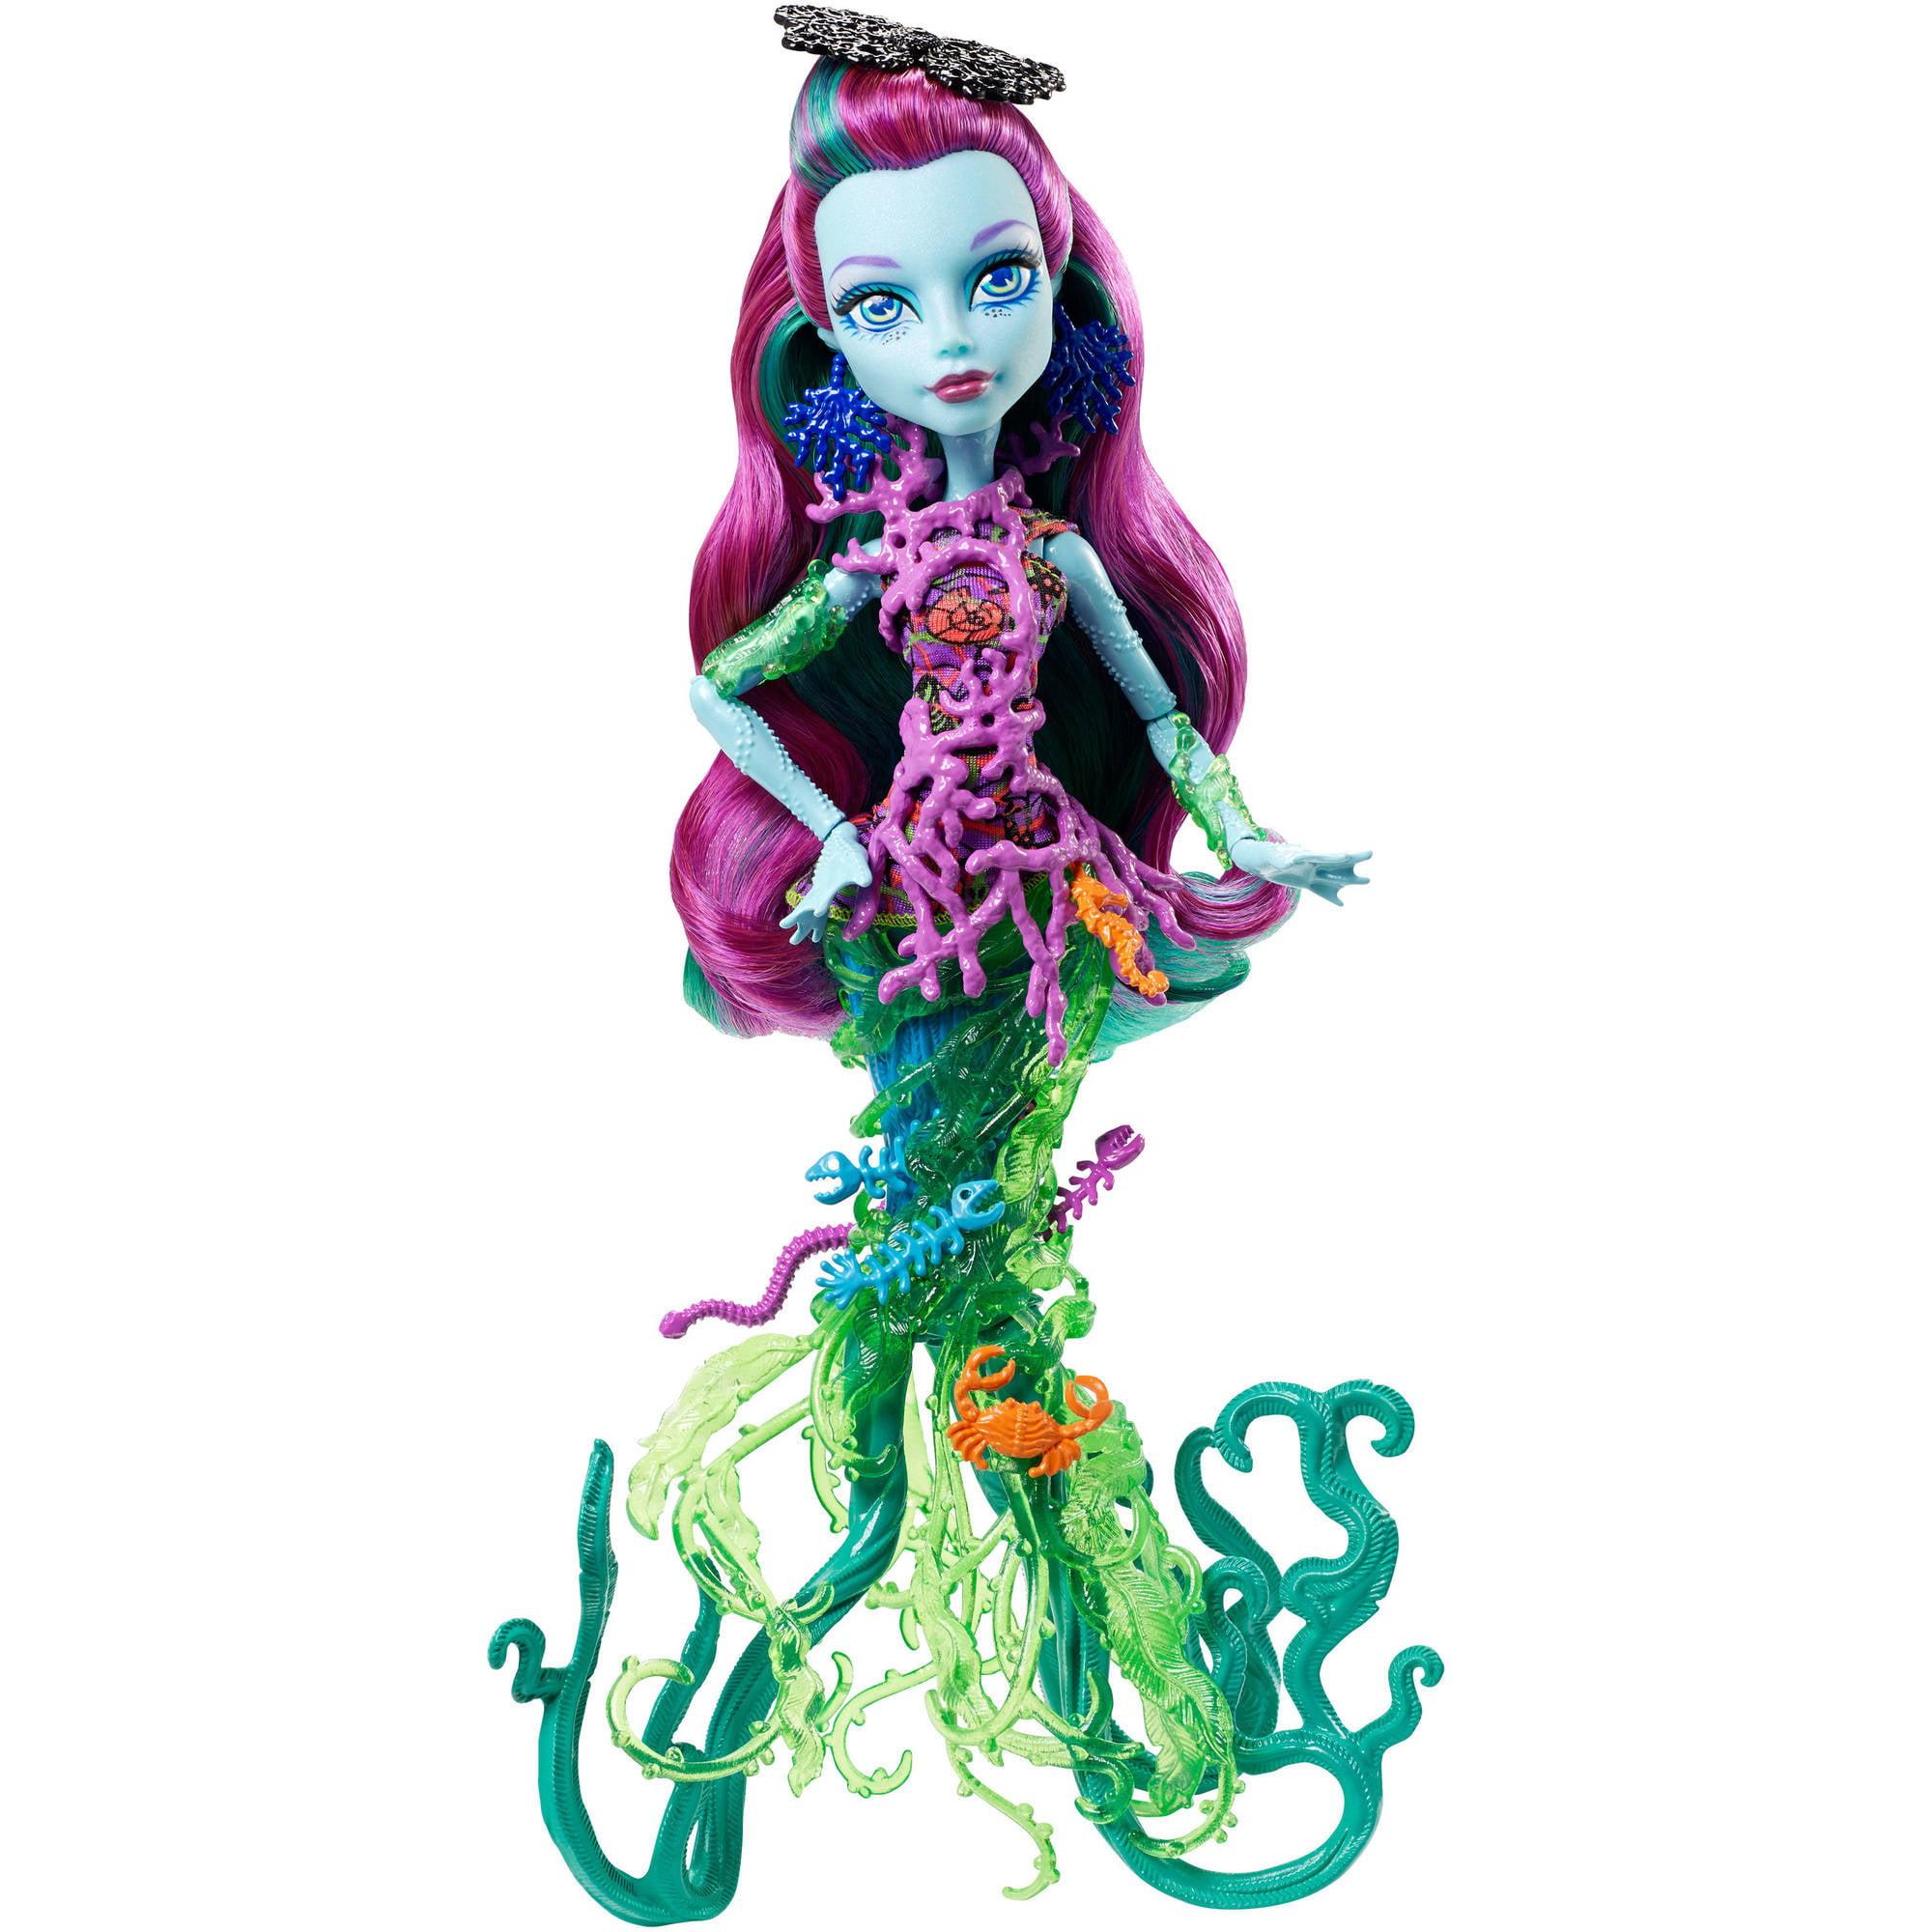 Monster High Great Scarrier Reef Posea Reef Doll by Mattel